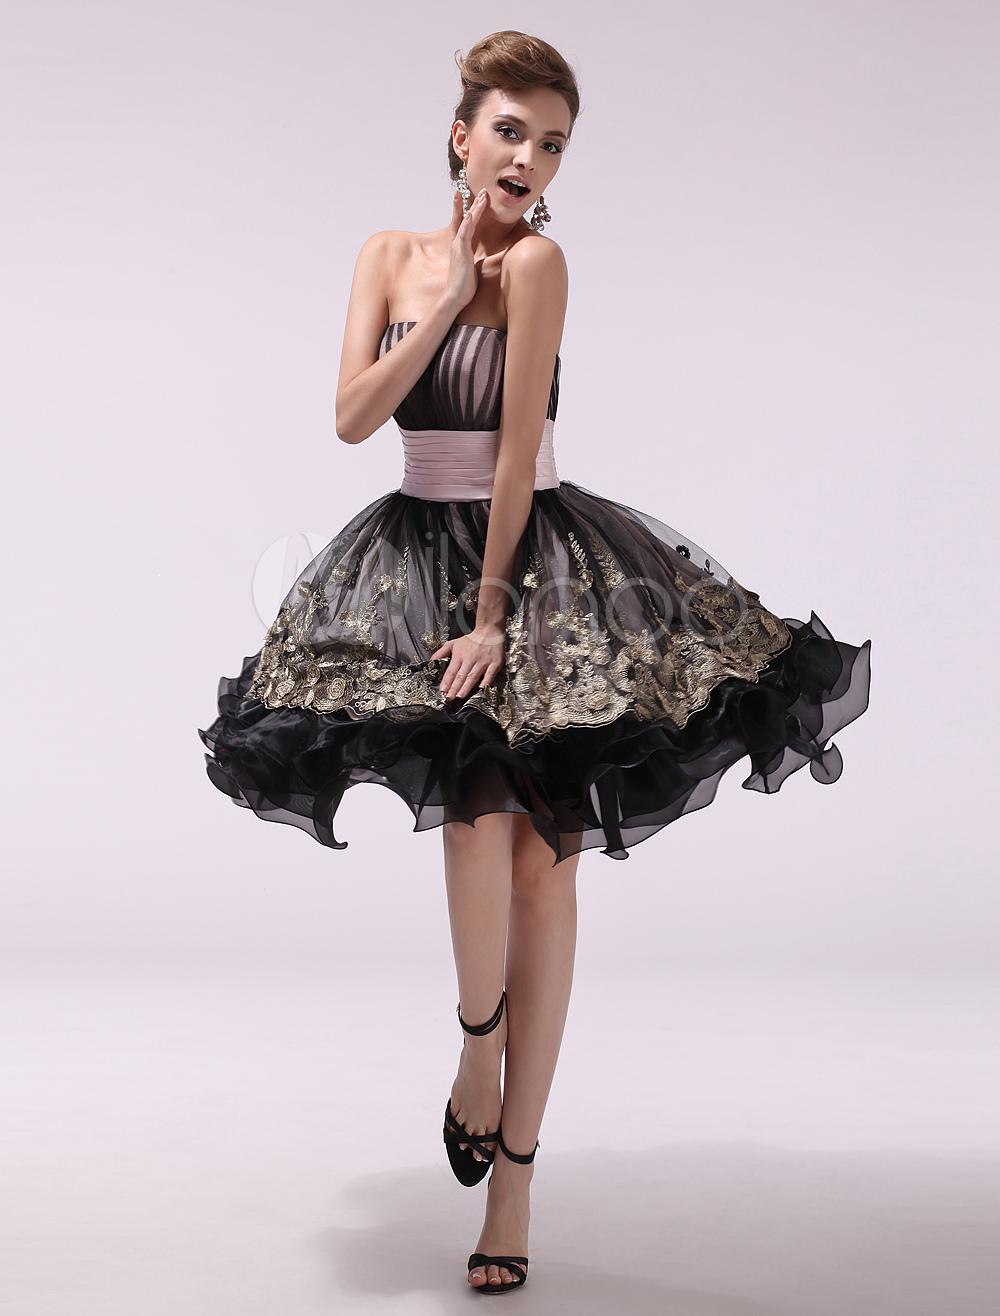 Black Strapless Sleeveless Pleated A-line Organza Prom Dress Milanoo (Wedding Prom Dresses) photo